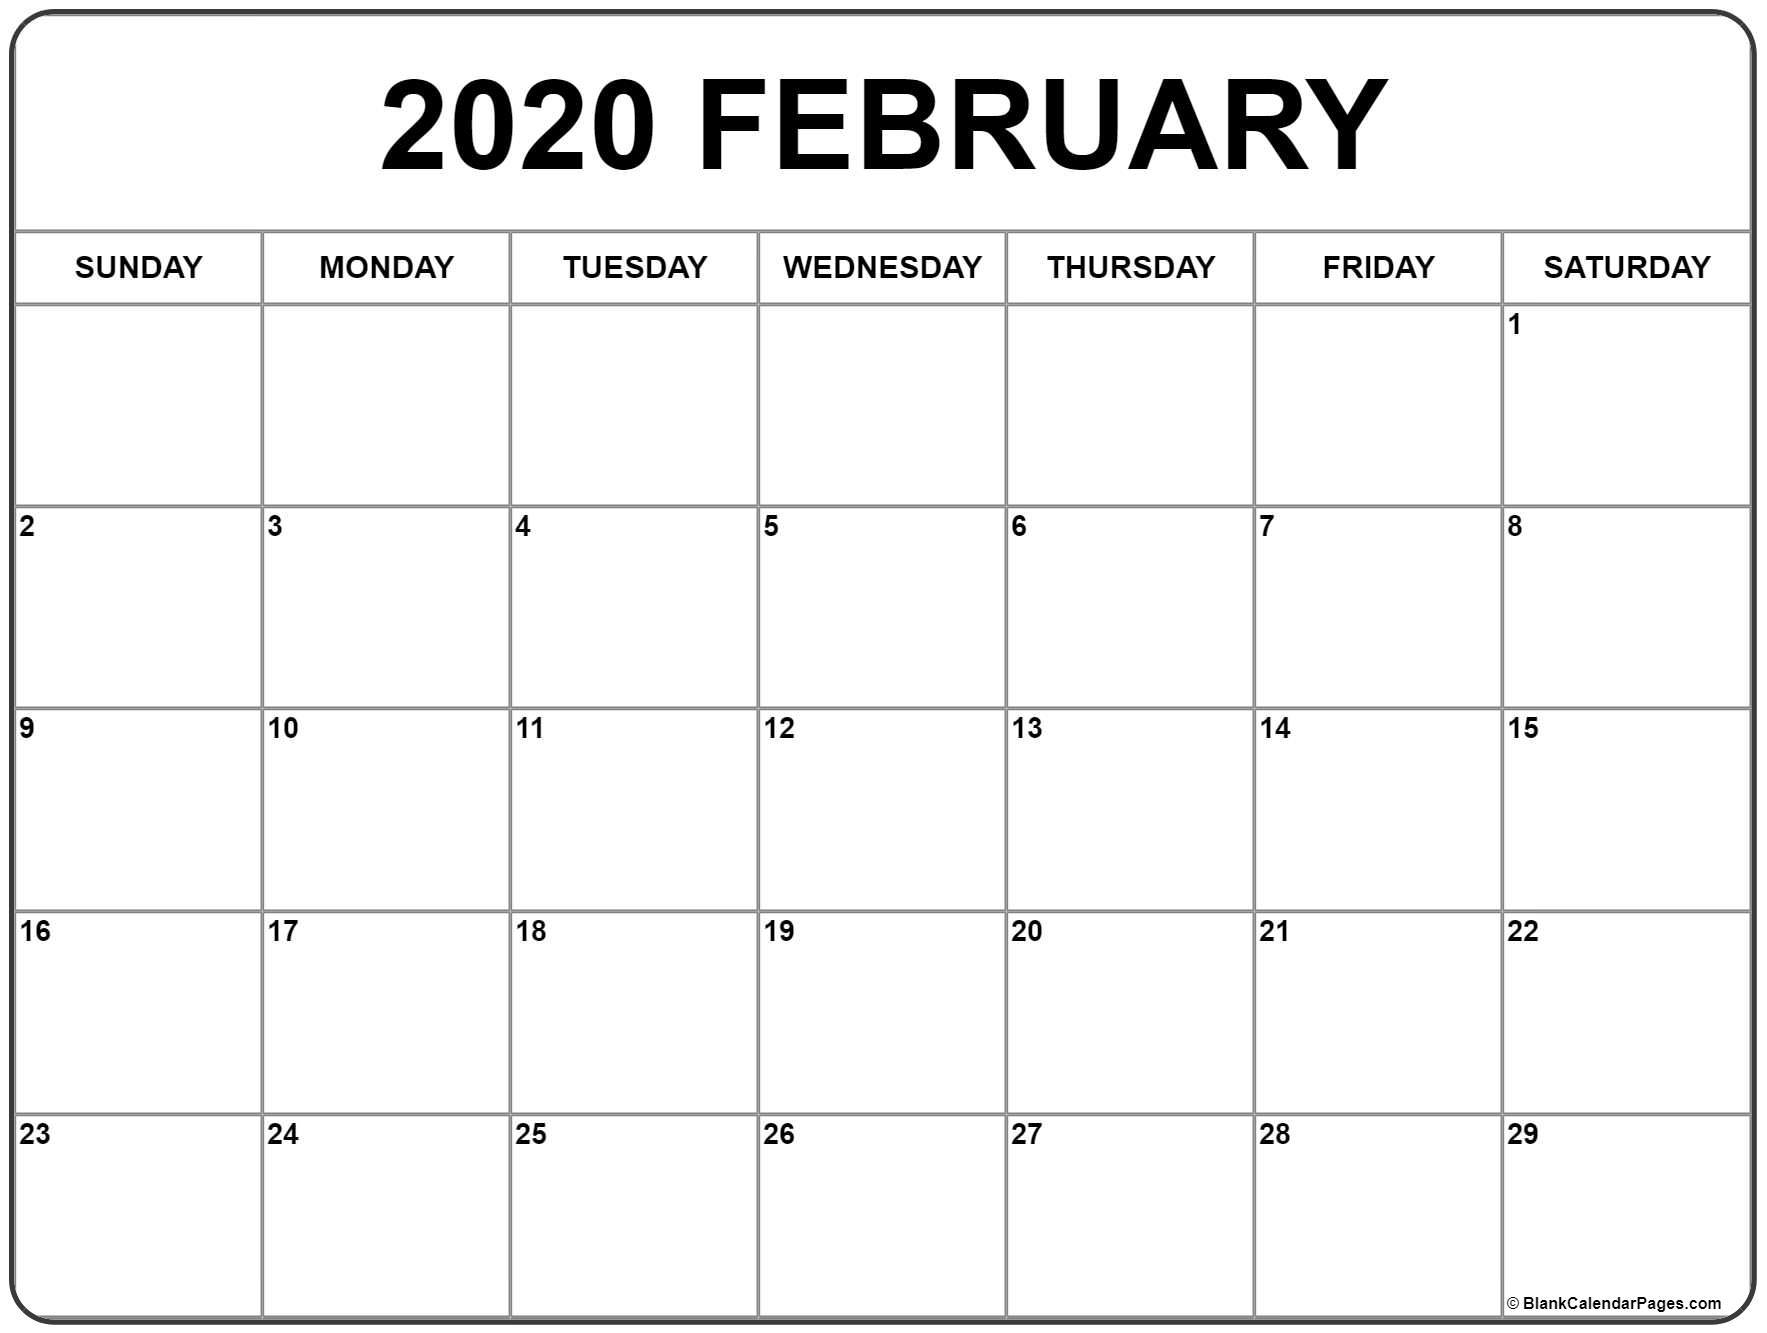 February 2020 Calendar | Free Printable Monthly Calendars inside Large Print 2020 Calendar To Print Free